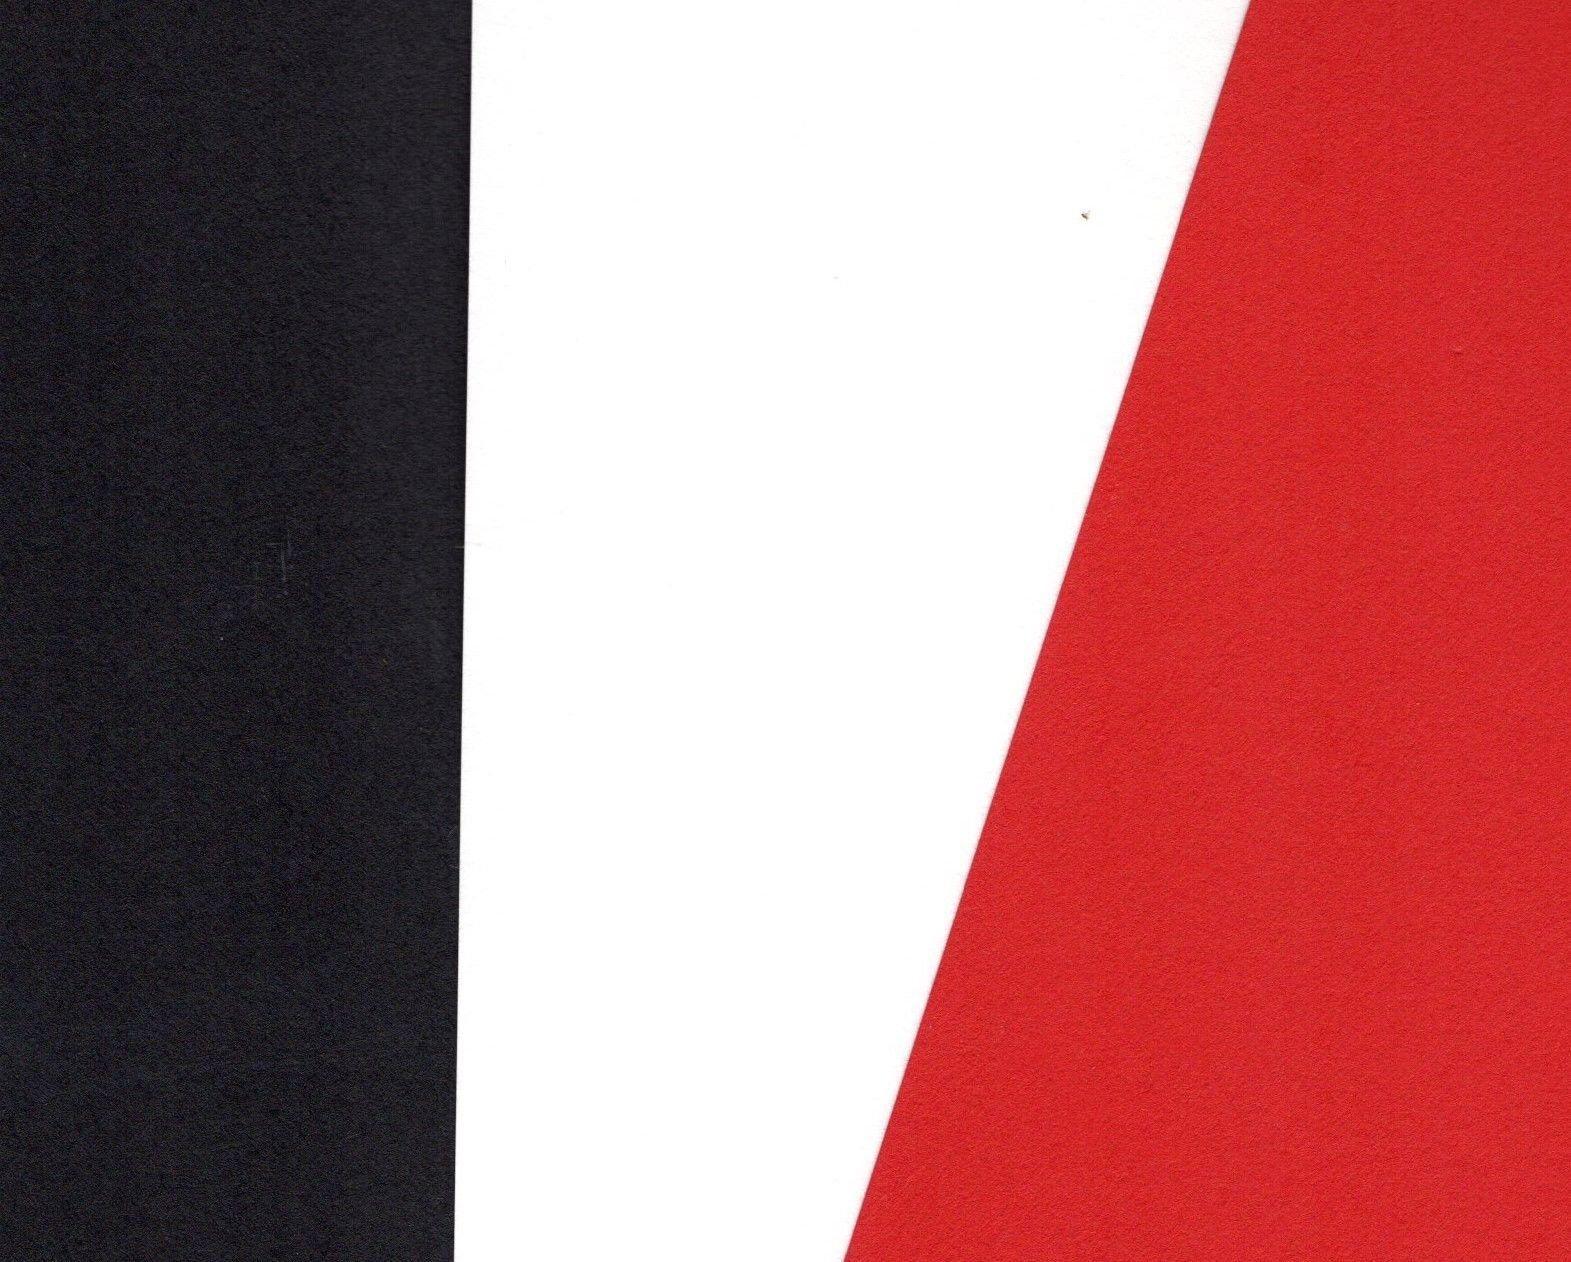 Mono Mix White and Grey 240GSM A4 CARD x 10 Black